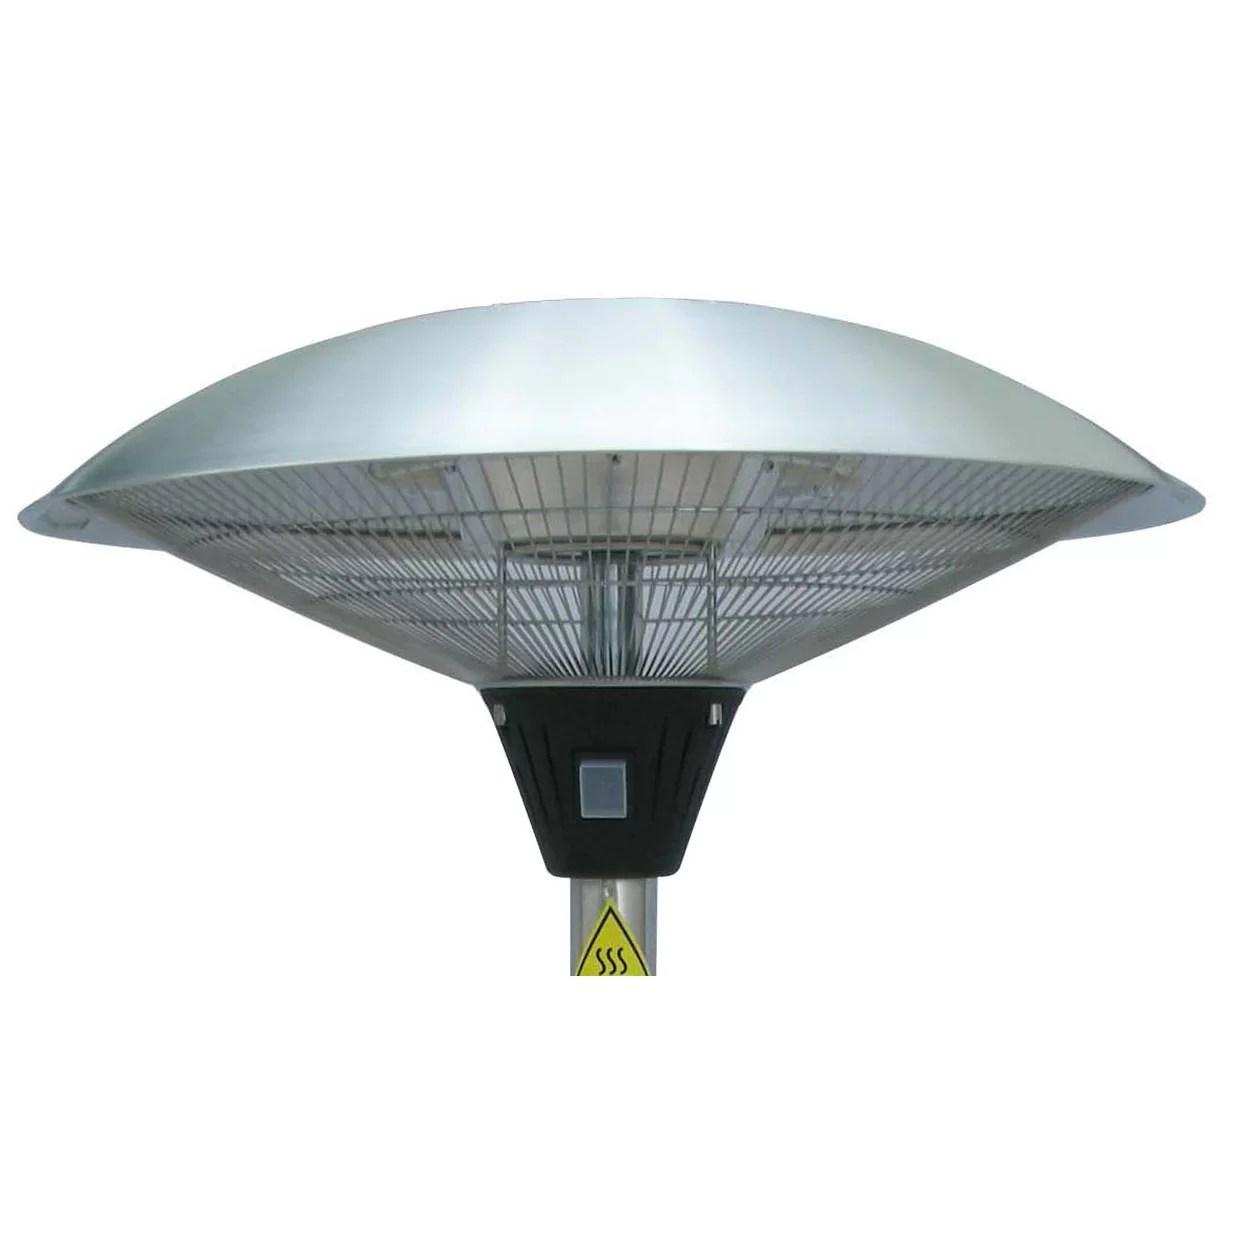 AZ Patio Heaters Tabletop Electric Patio Heater  Reviews